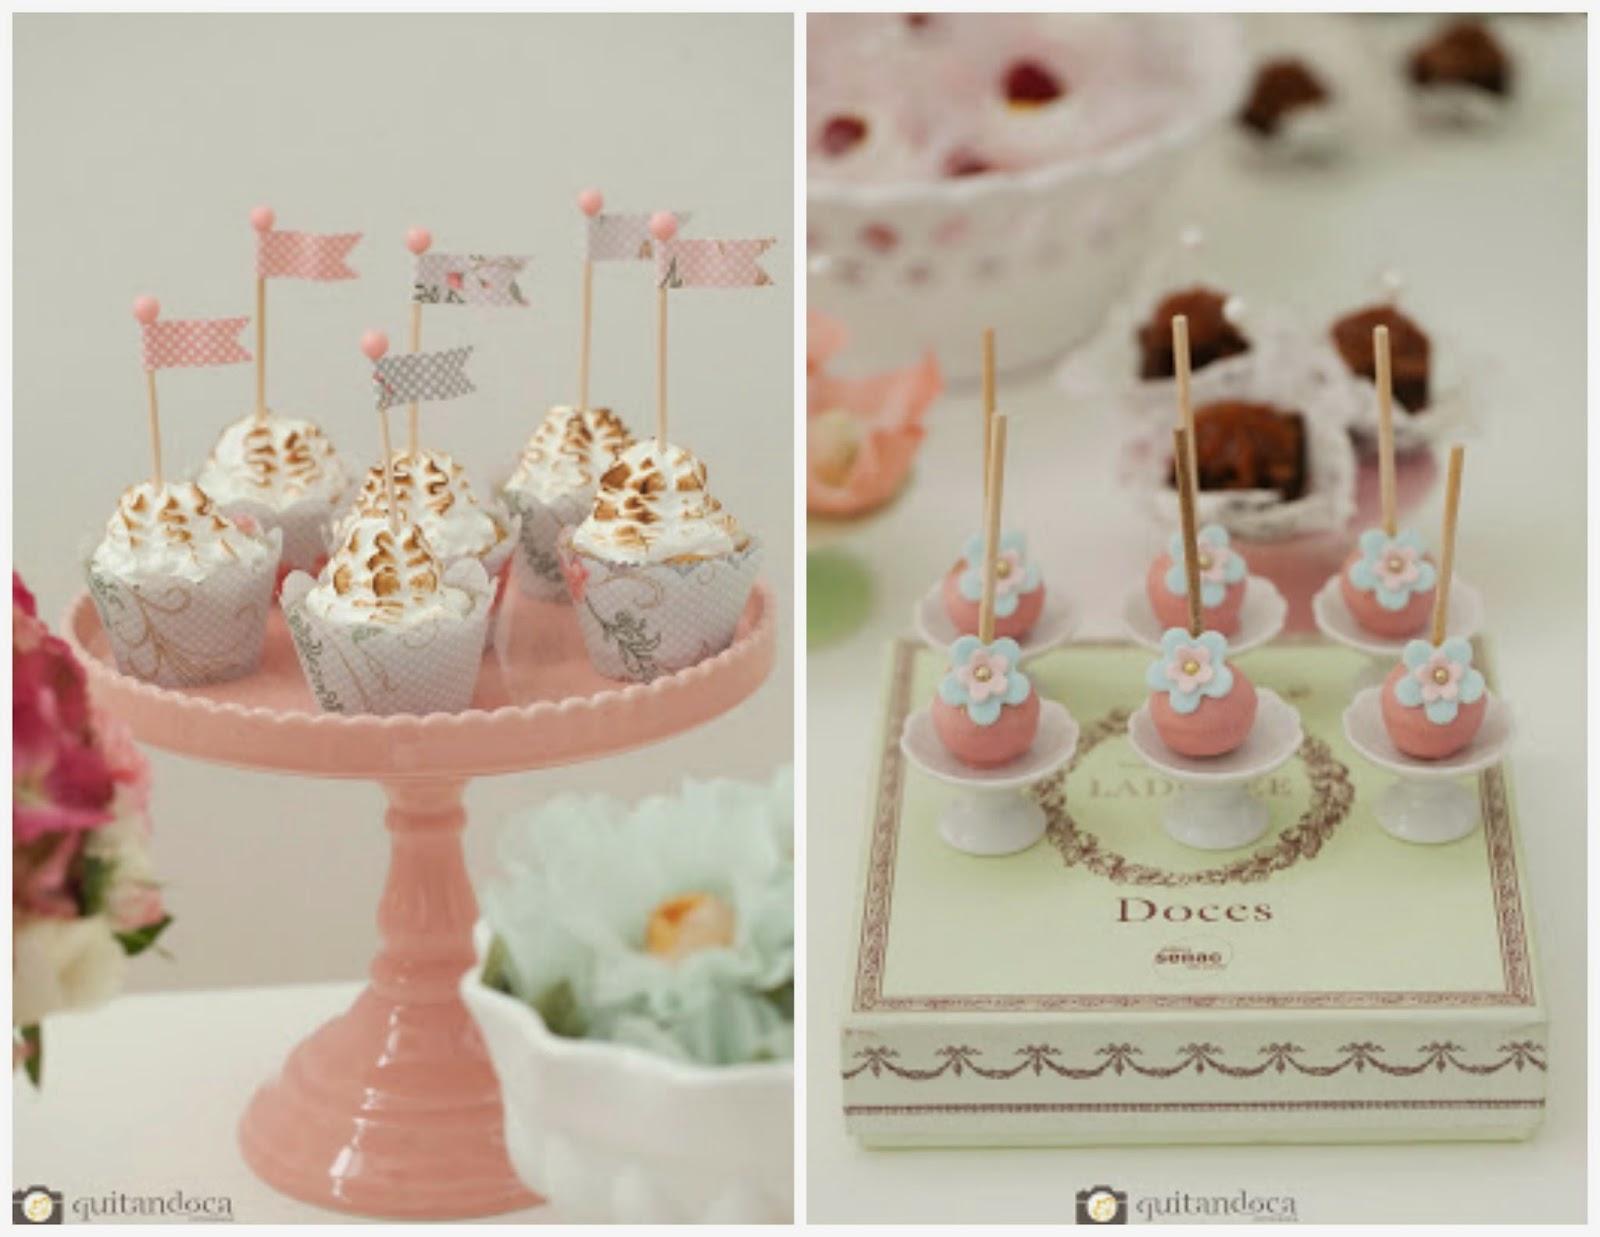 inspiracao-shabby-chic-romantica-delicada-candy-colors-cupcakes-popcakes